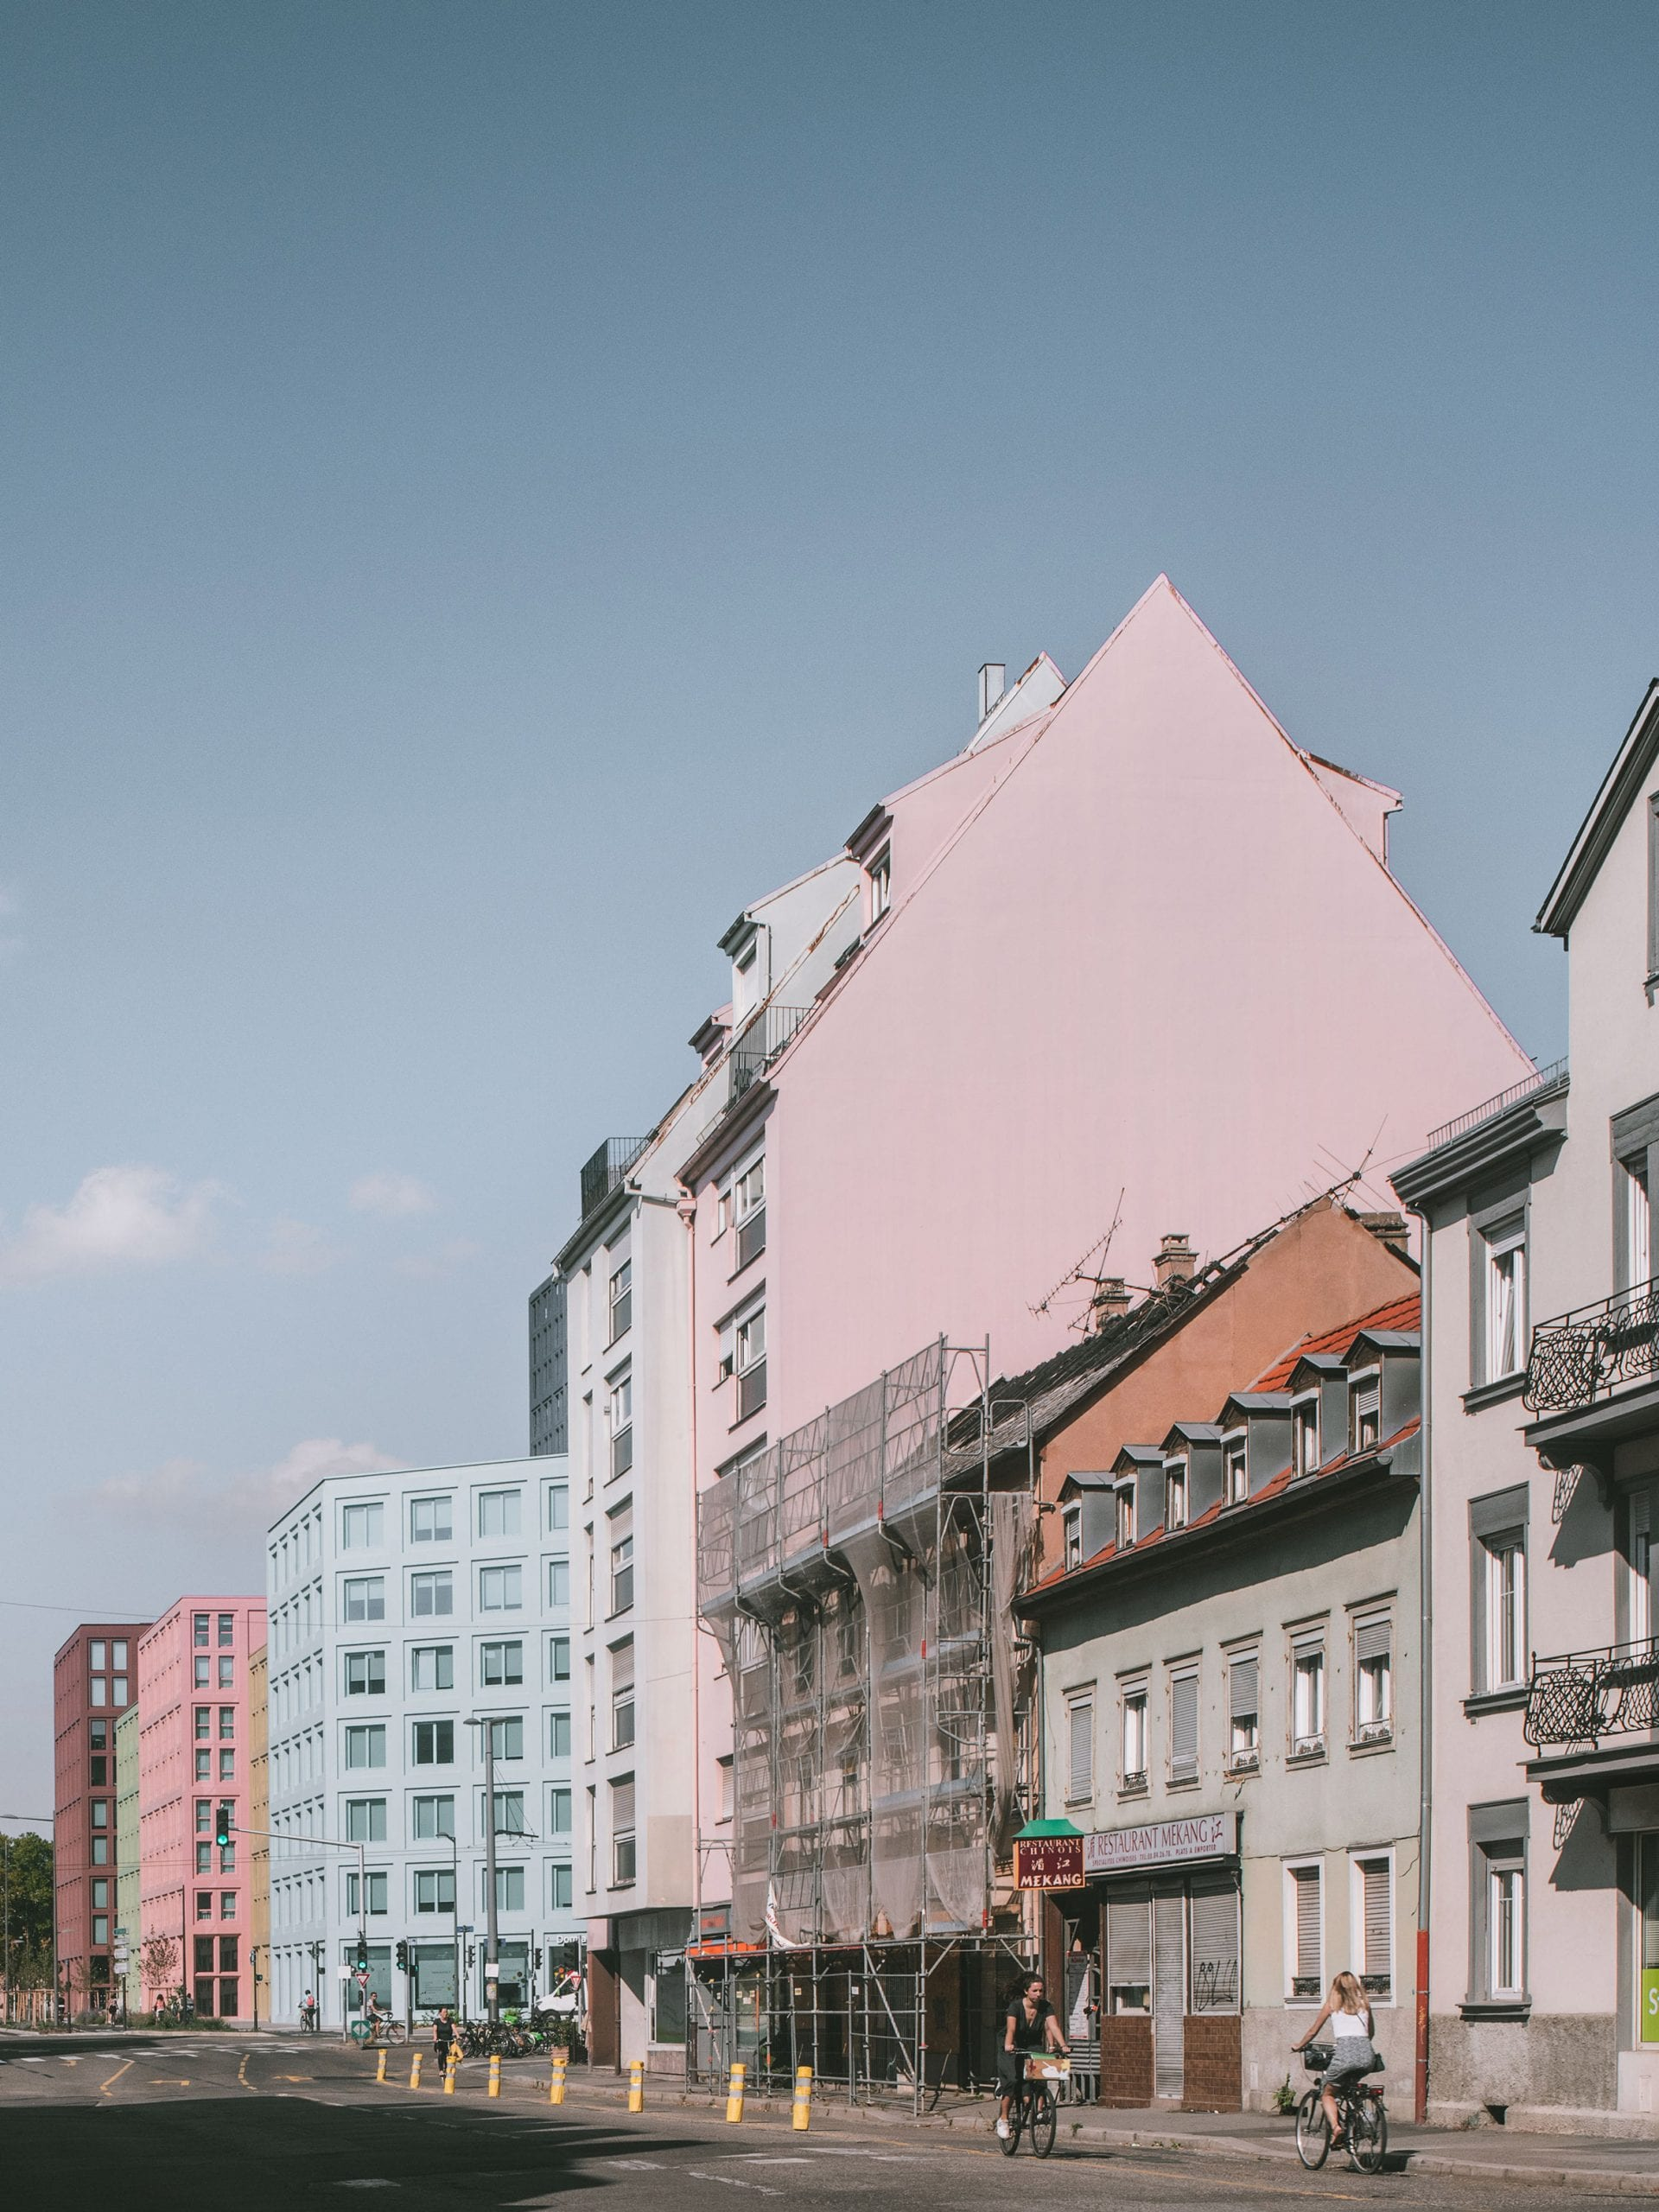 Exterior of housing development